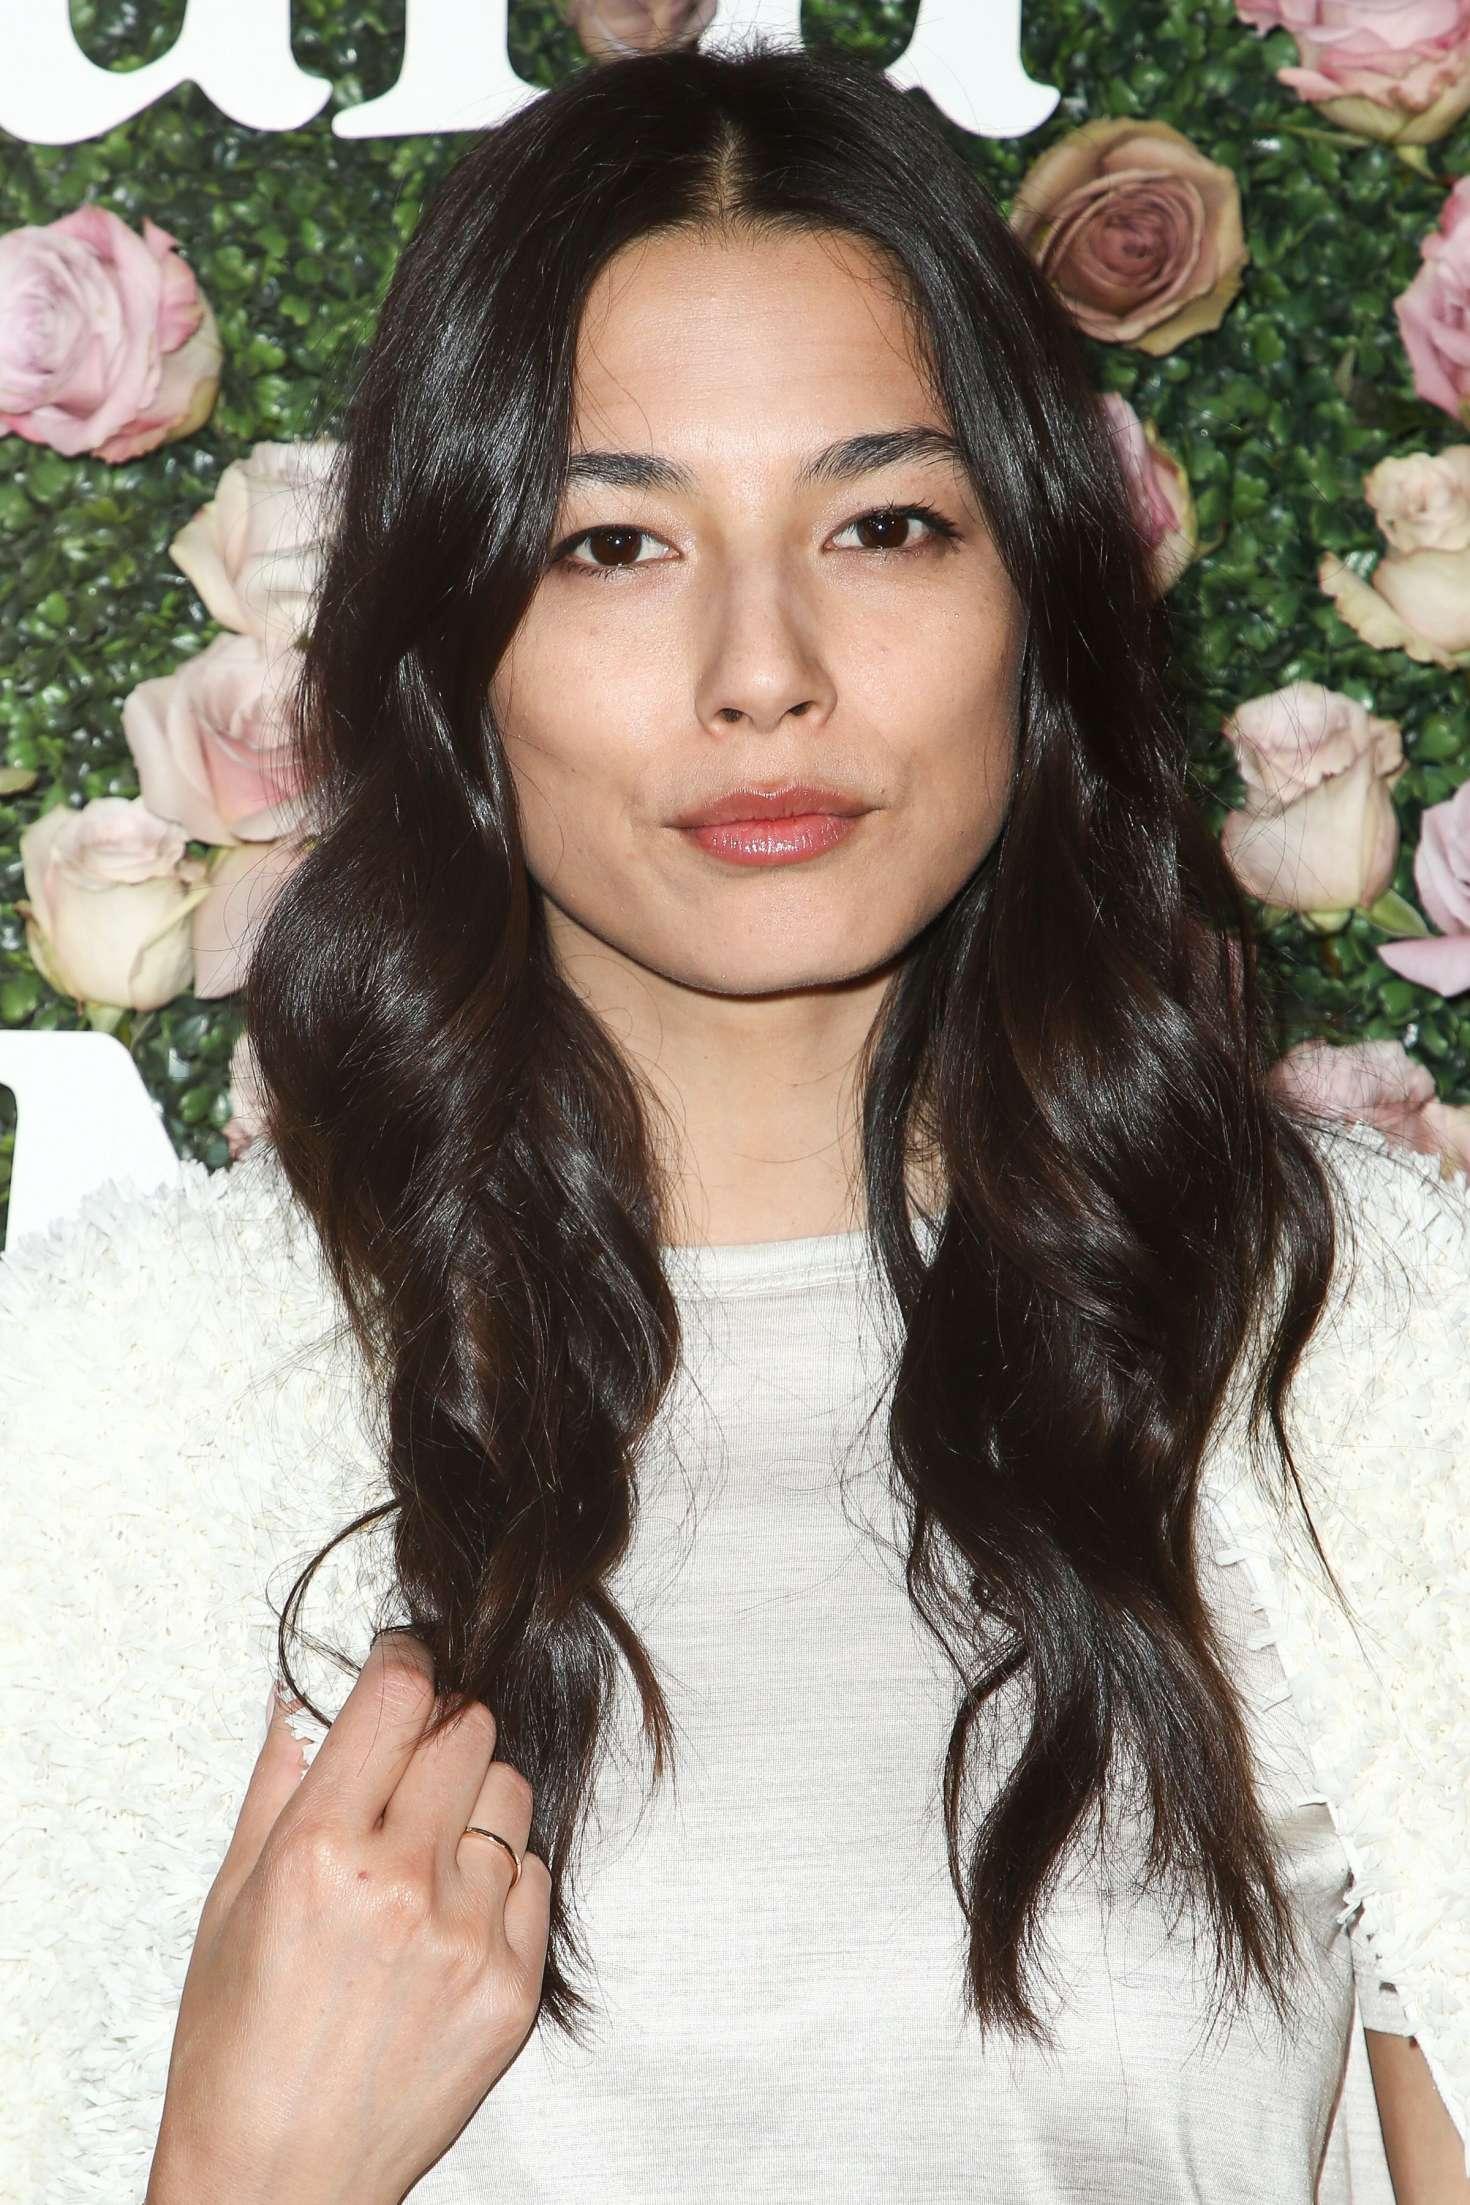 jessica gomes 2017 women in film max mara face of the